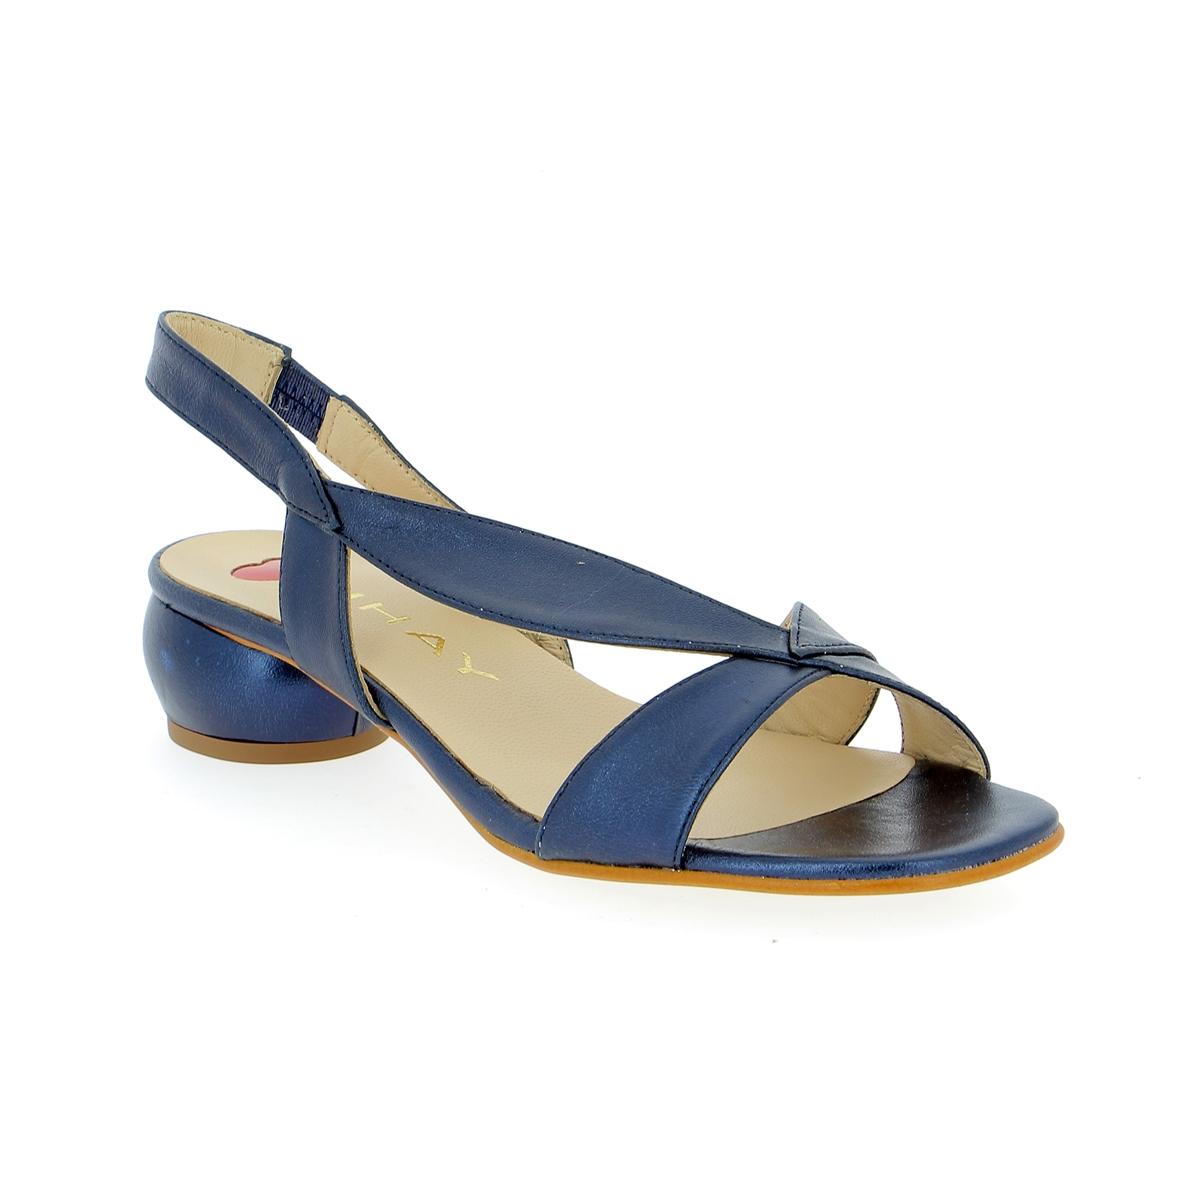 J'hay Sandales bleu